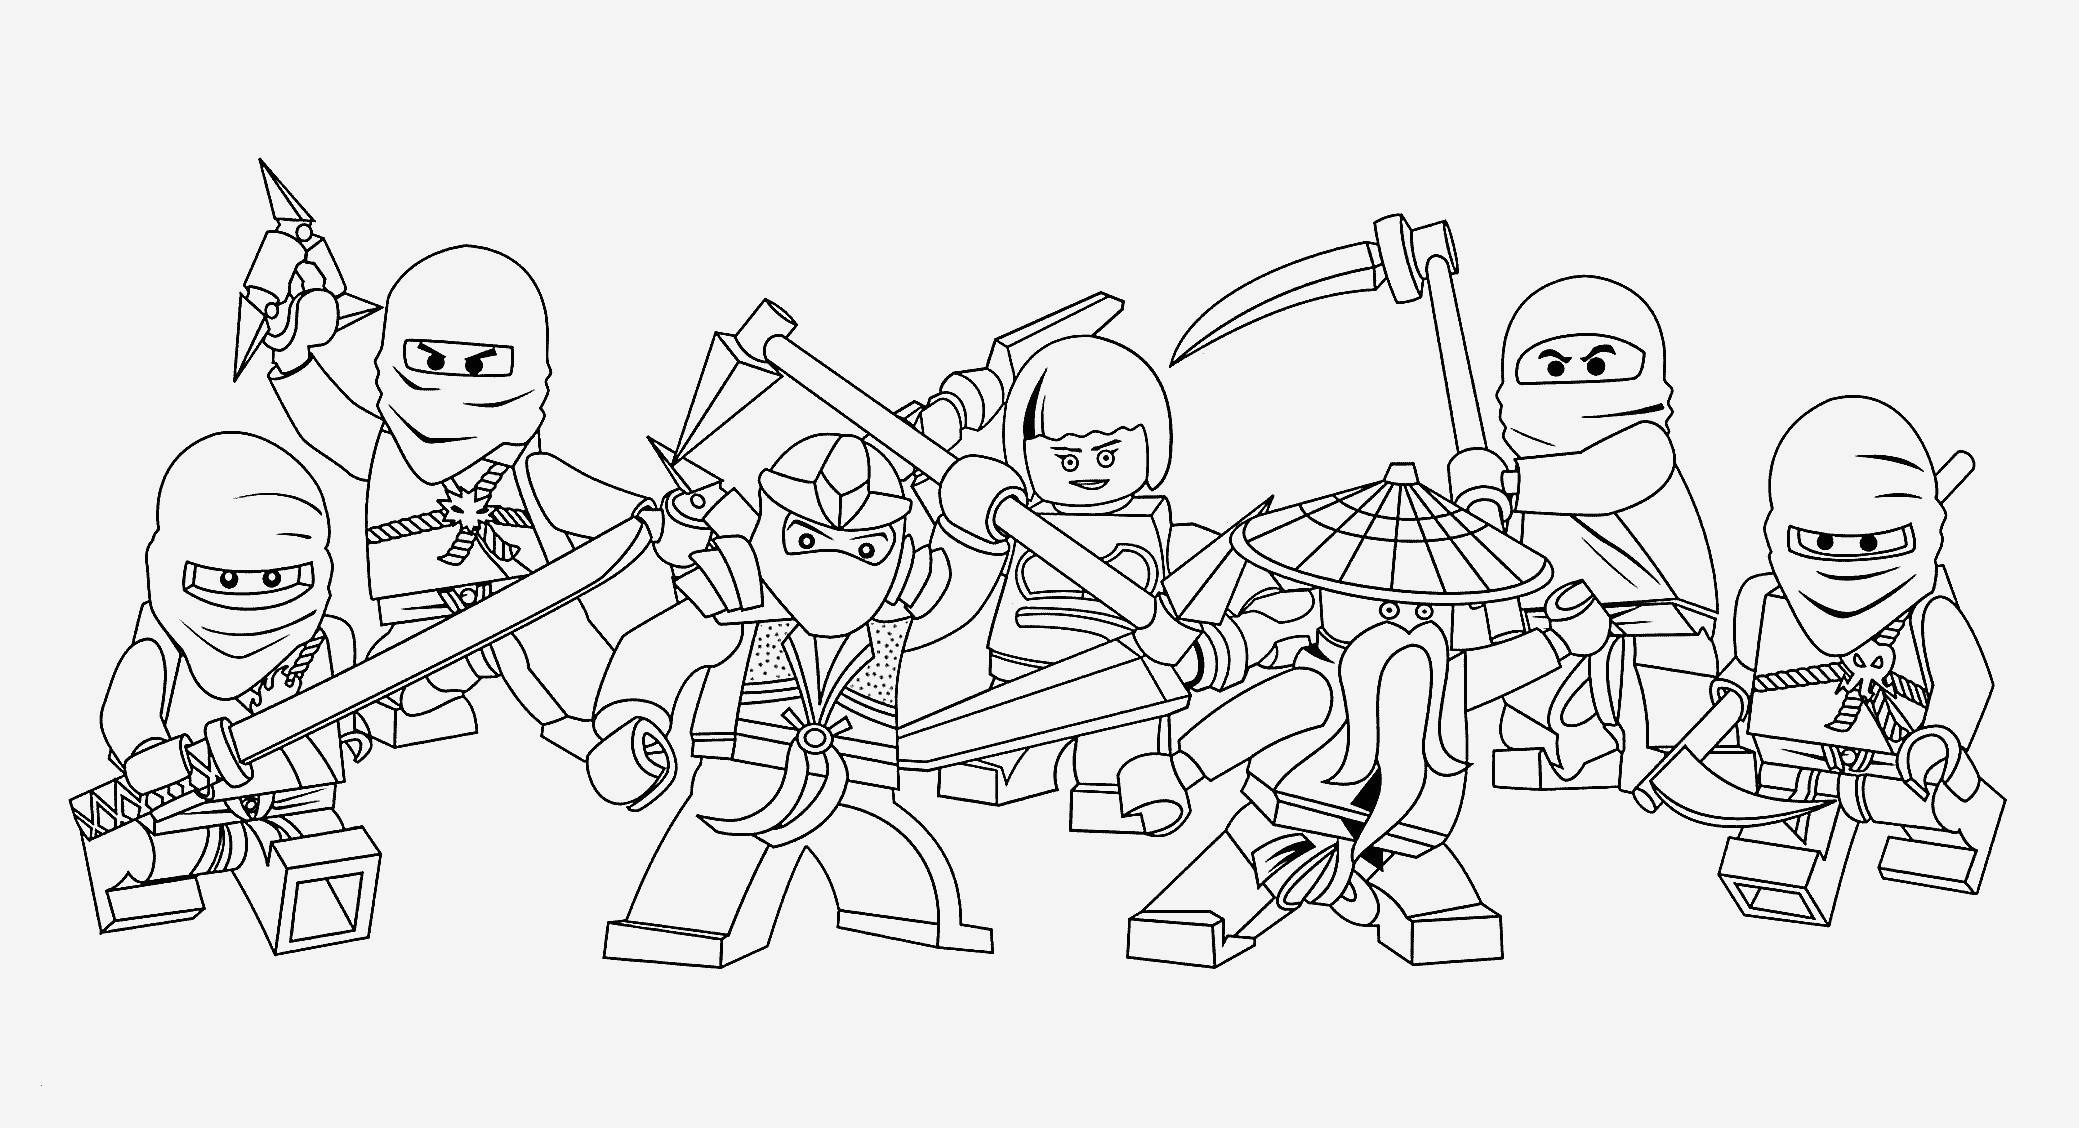 Lego Ninjago Zum Ausmalen Inspirierend Bilder Zum Ausmalen Bekommen Ausmalbilder Ninjago Movie Bilder